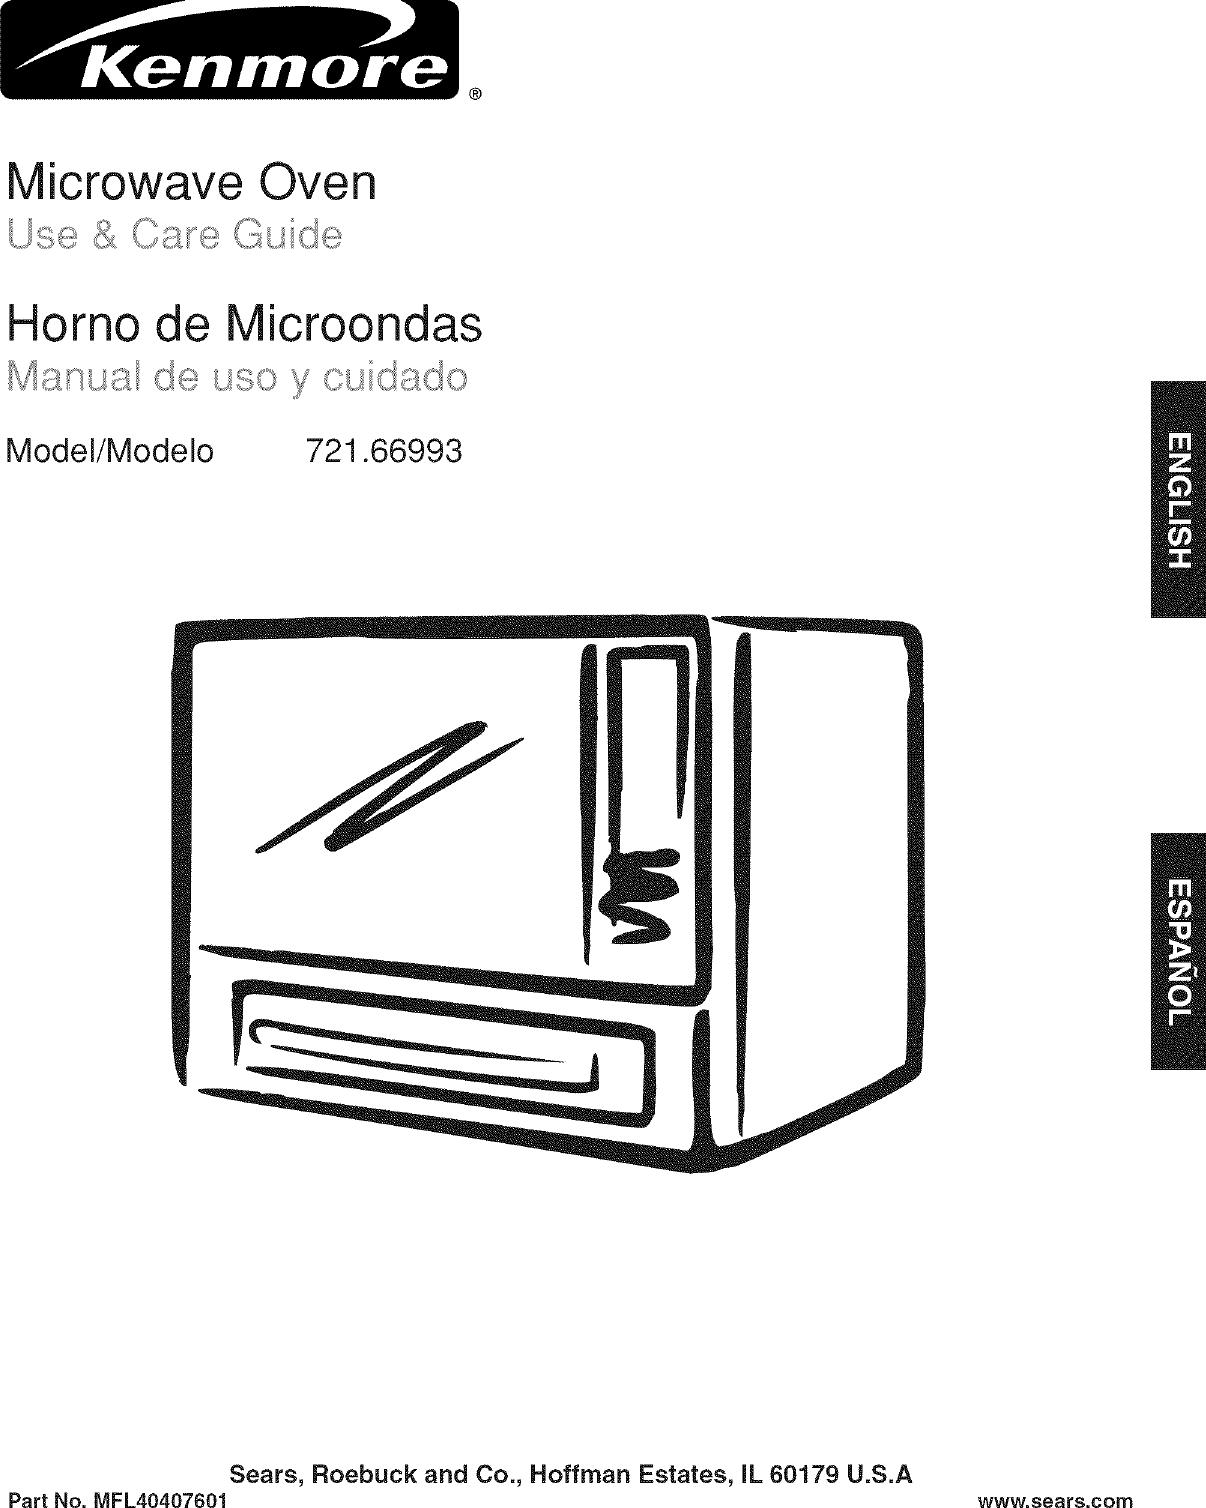 Kenmore Microwave Troubleshooting Manual